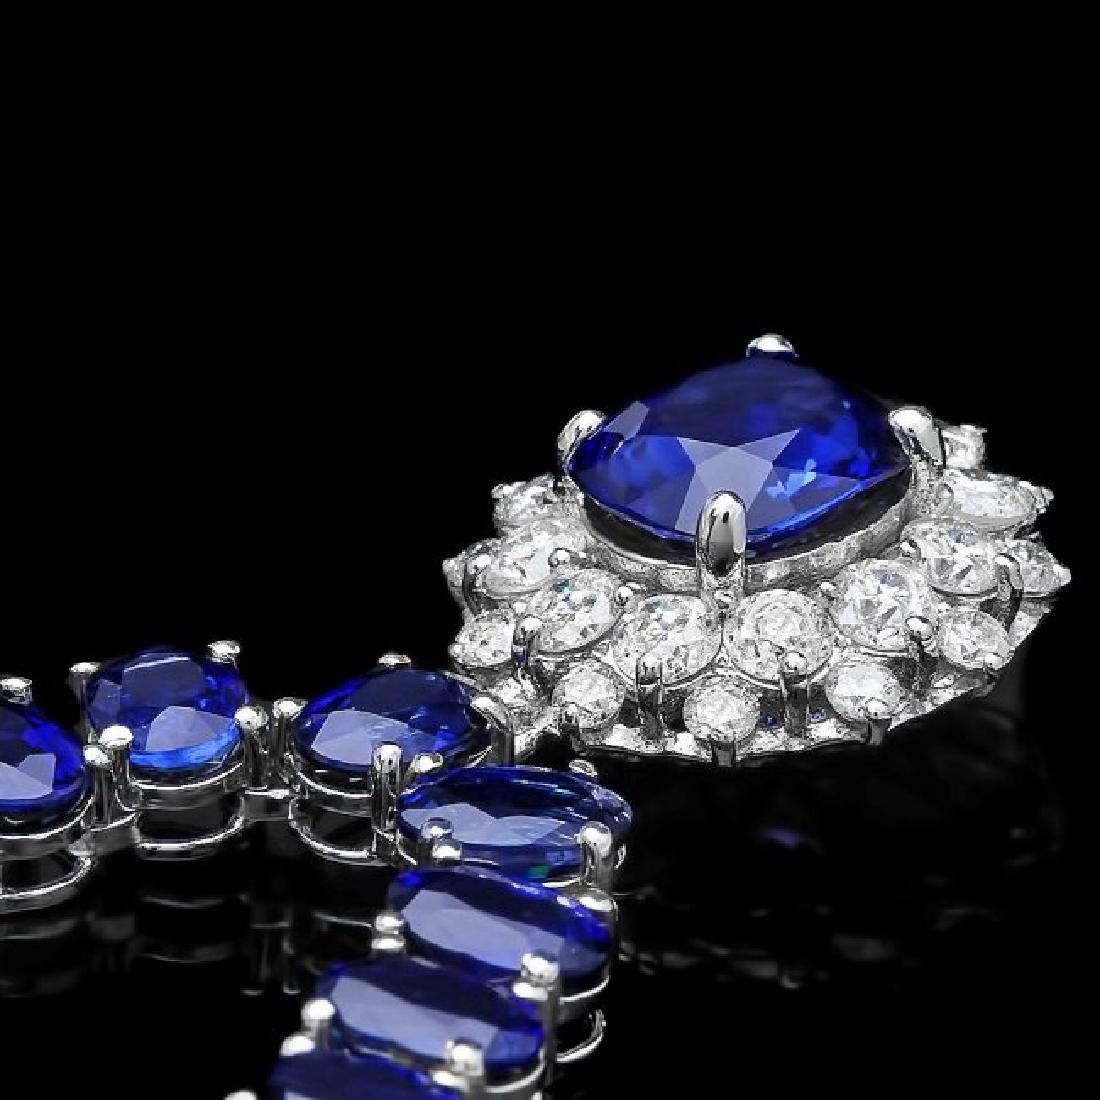 14k Gold 51.5ct Sapphire 1.55ct Diamond Necklace - 2